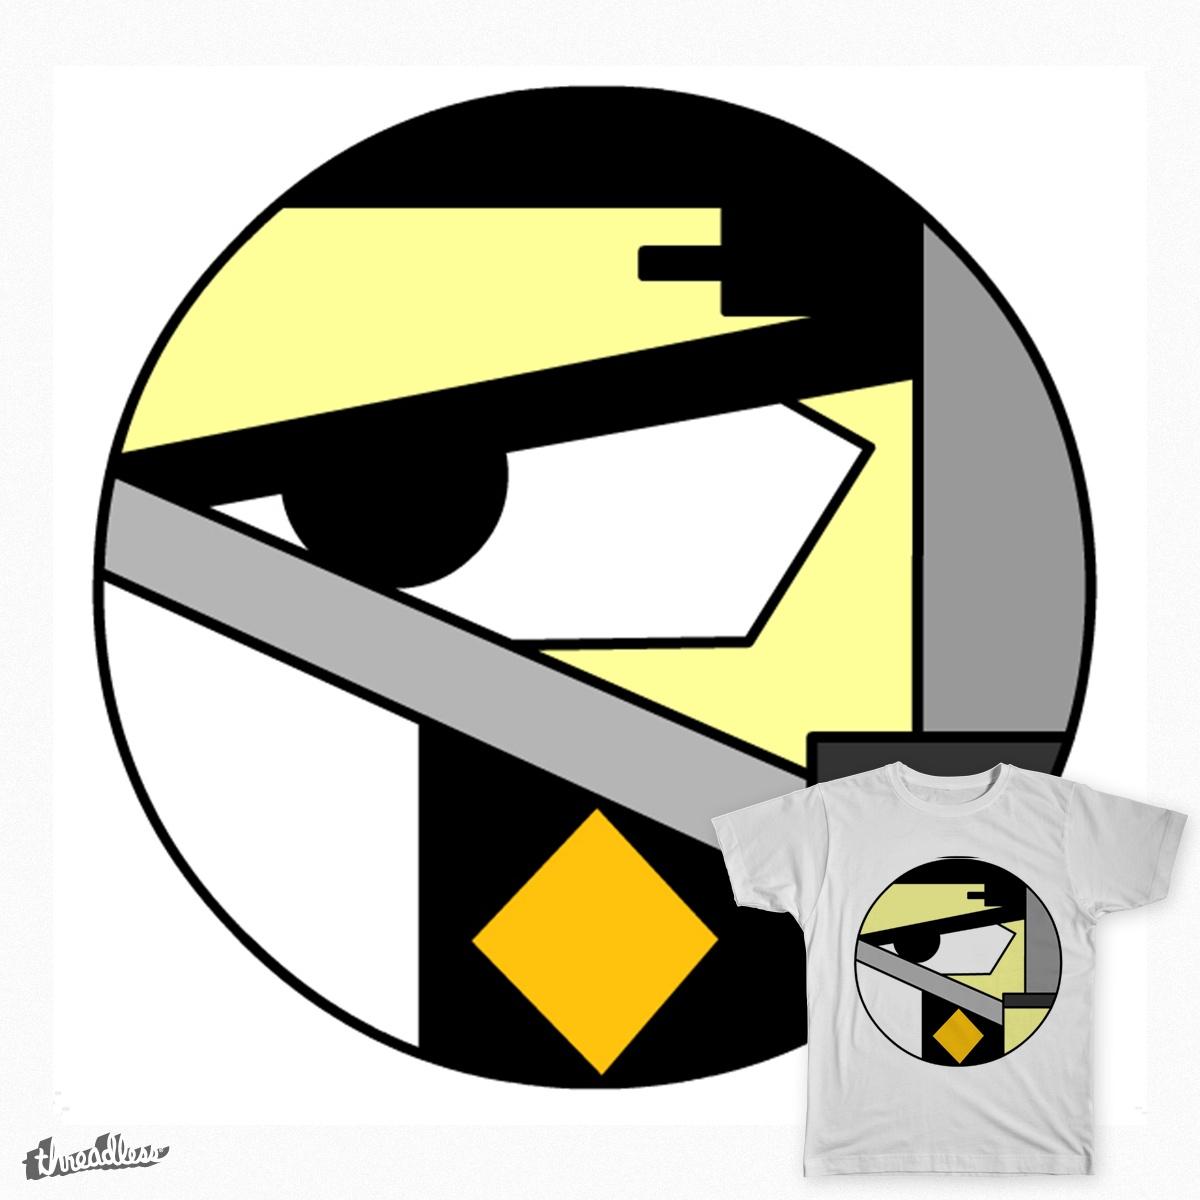 Cartoon Circle - Samurai Jack by Birdstick on Threadless